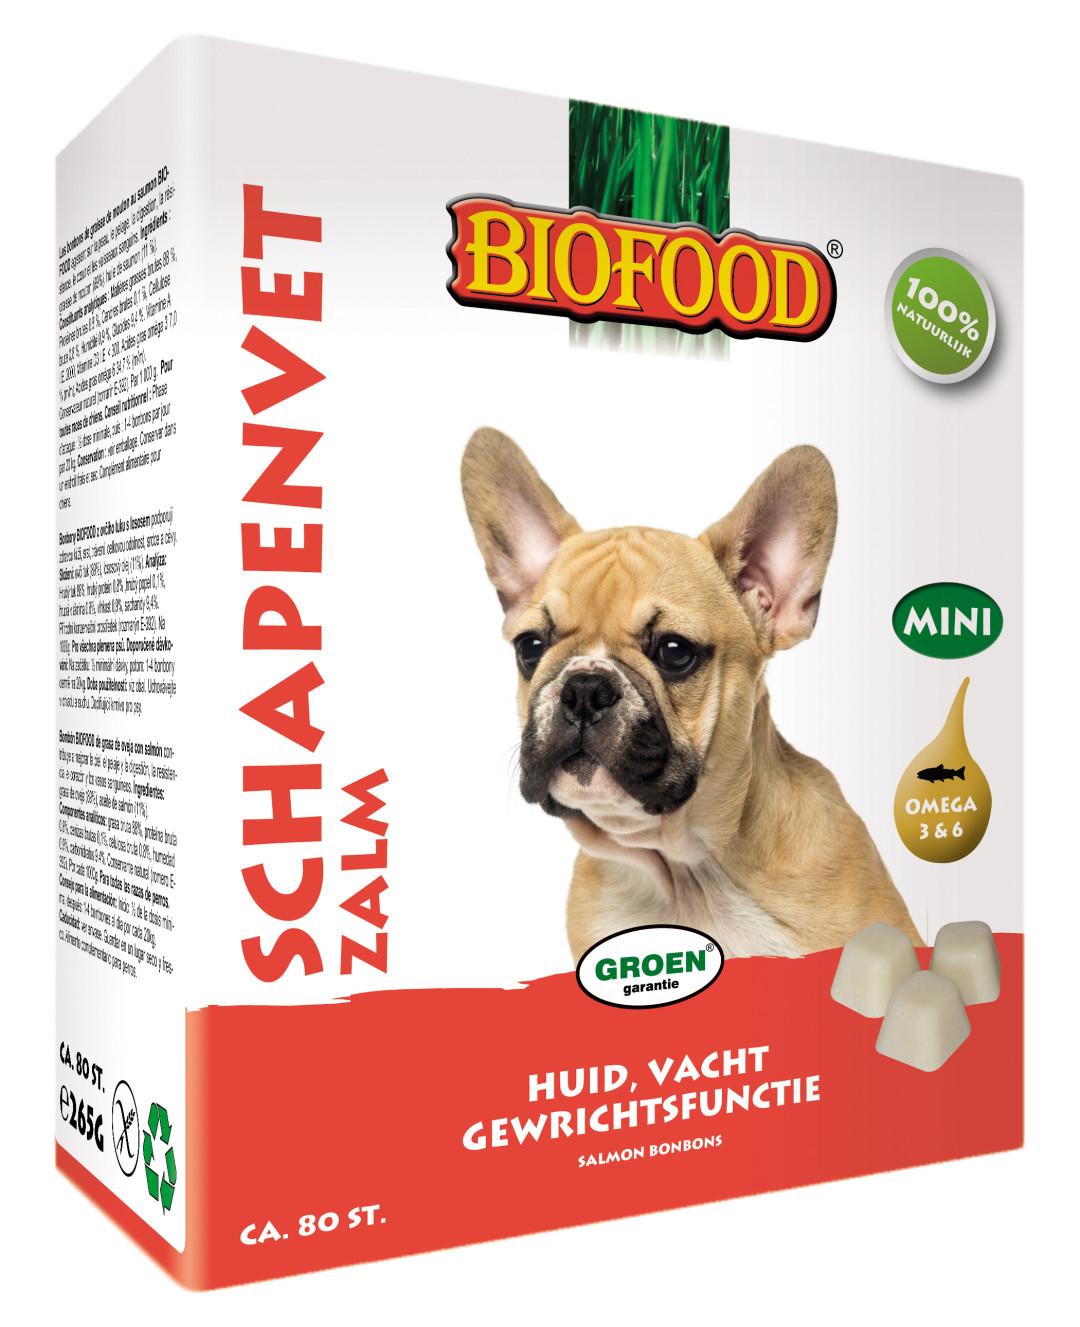 Biofood Schapenvet Zalm 80 st (mini)